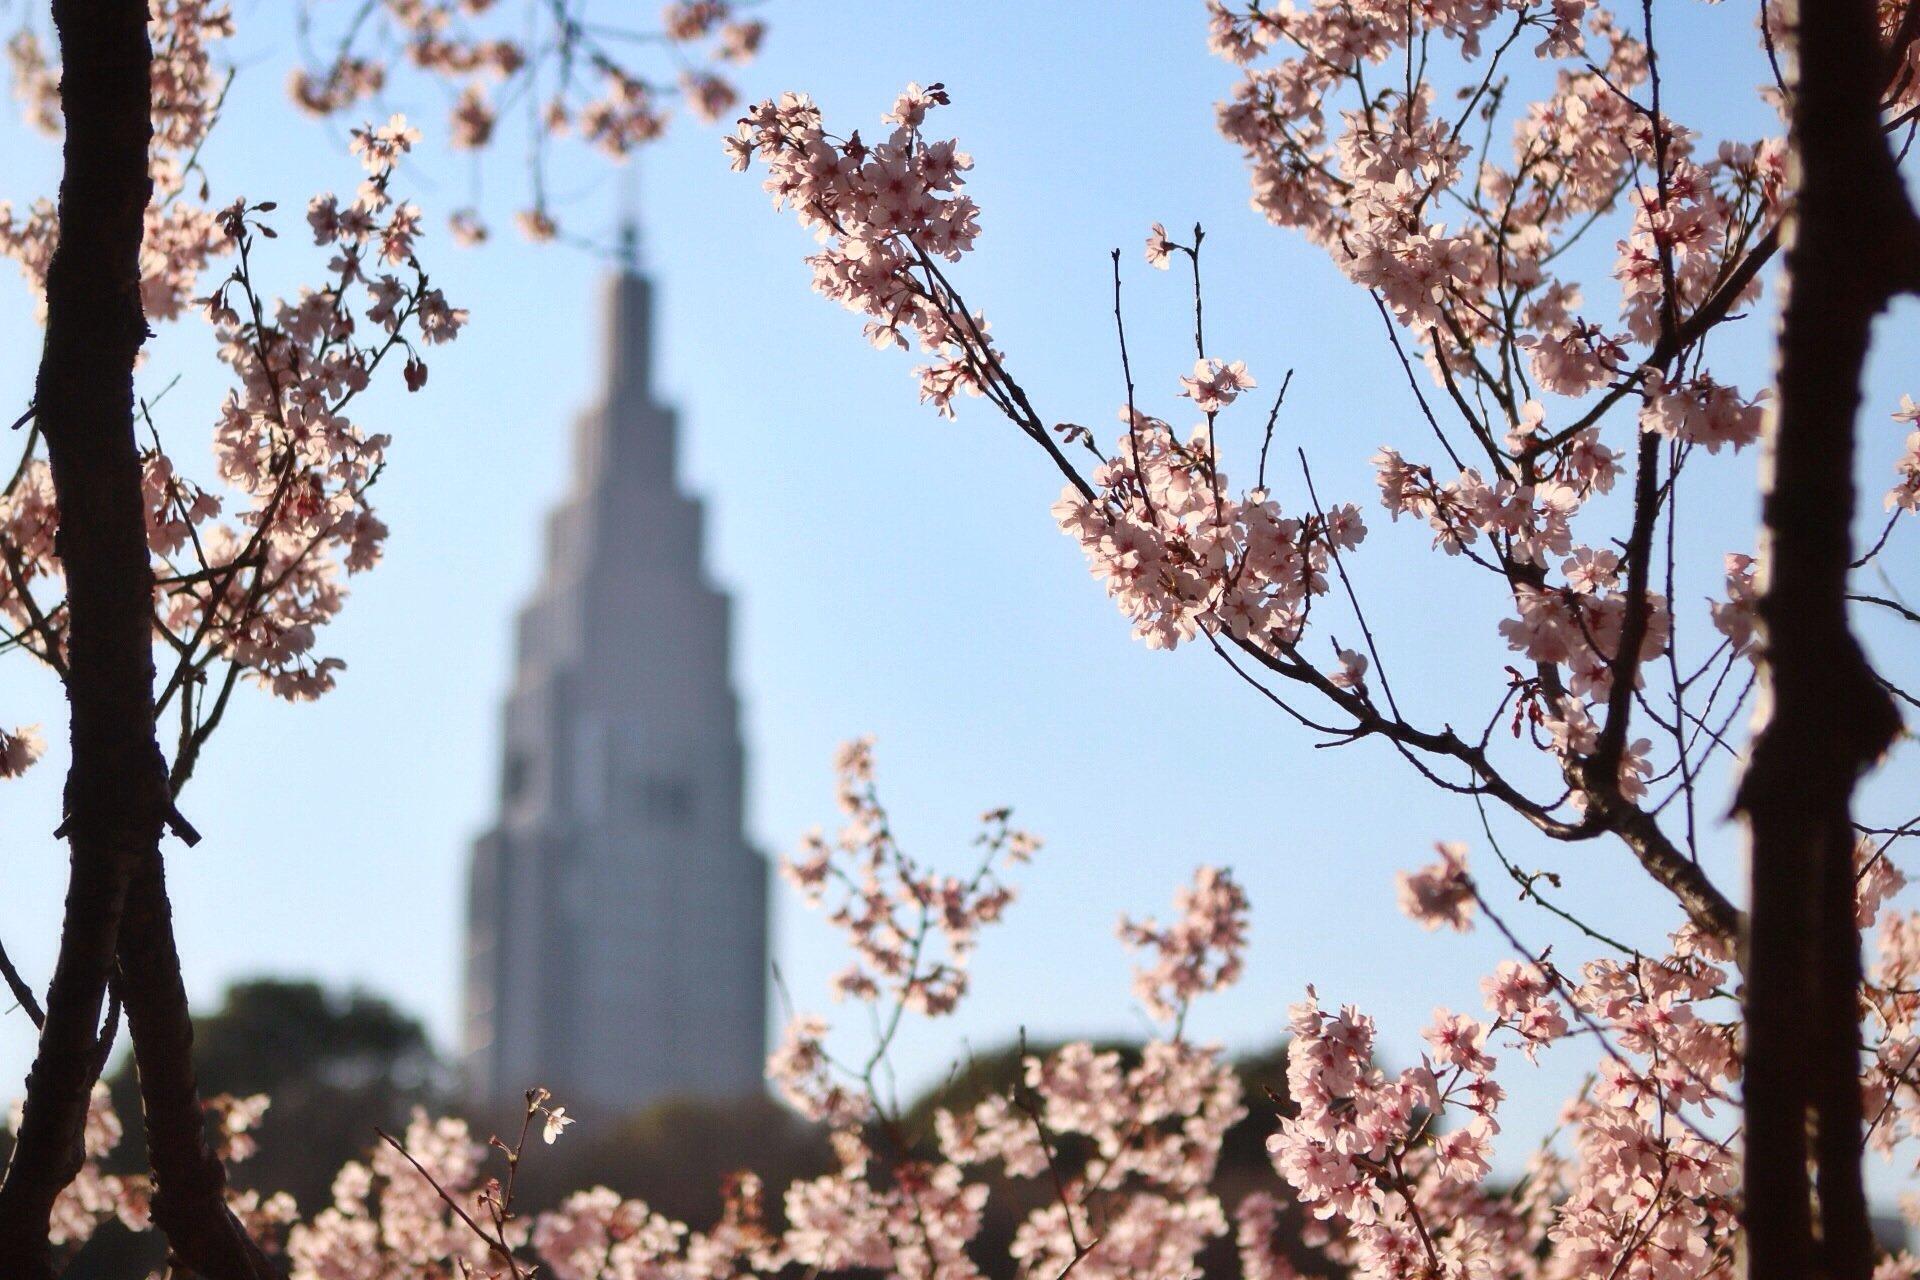 sakura-cherry-blossom-kasuma-tokyo-garden-photography-blog